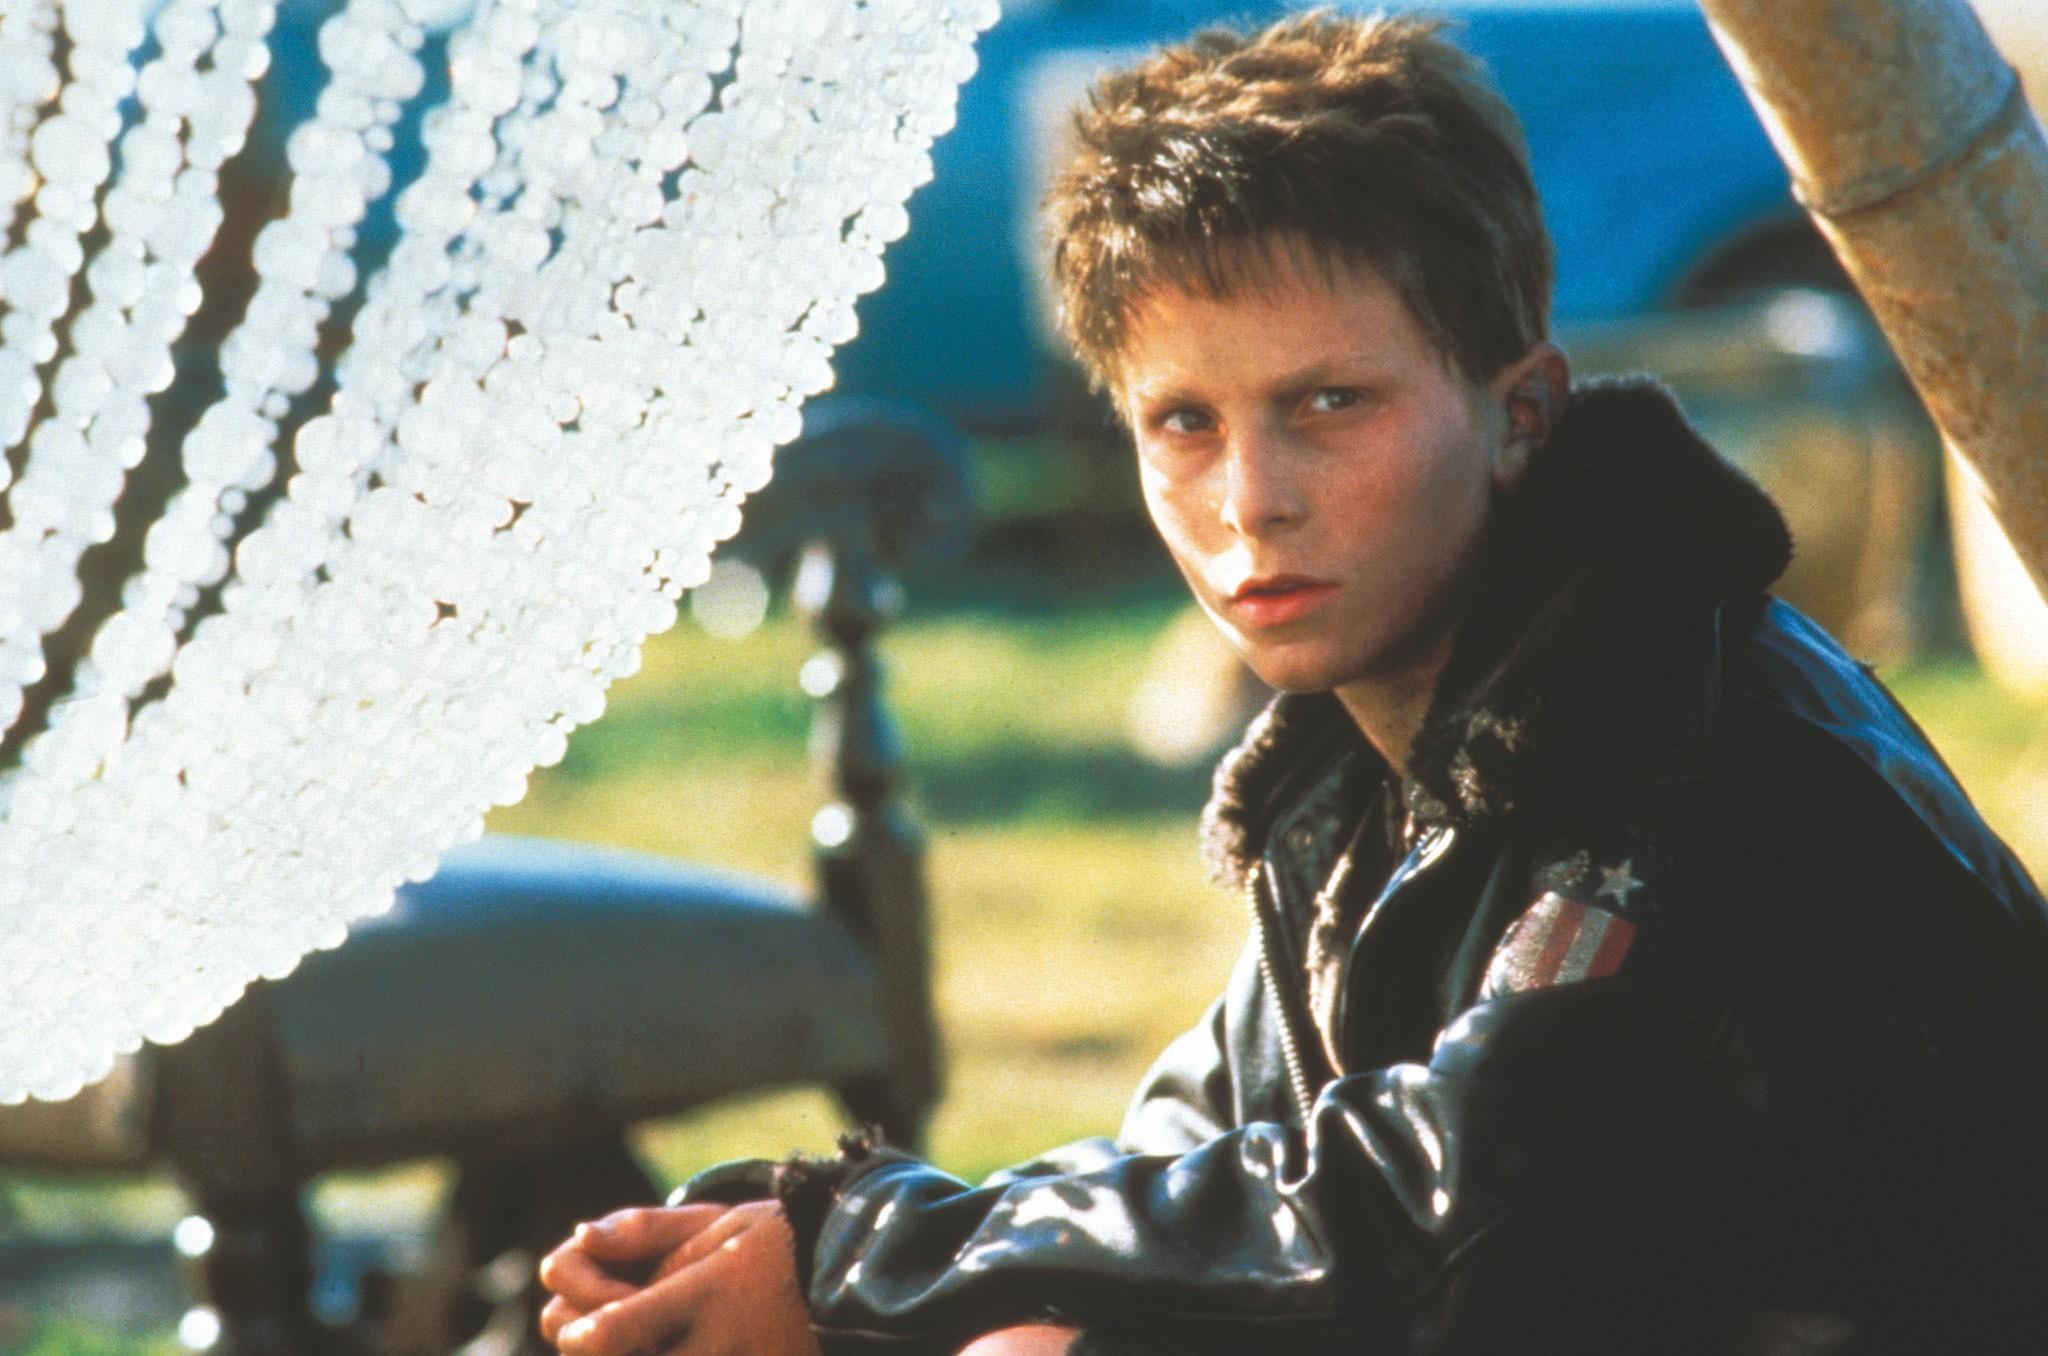 Империя Солнца (1987) Кристиан Бейл